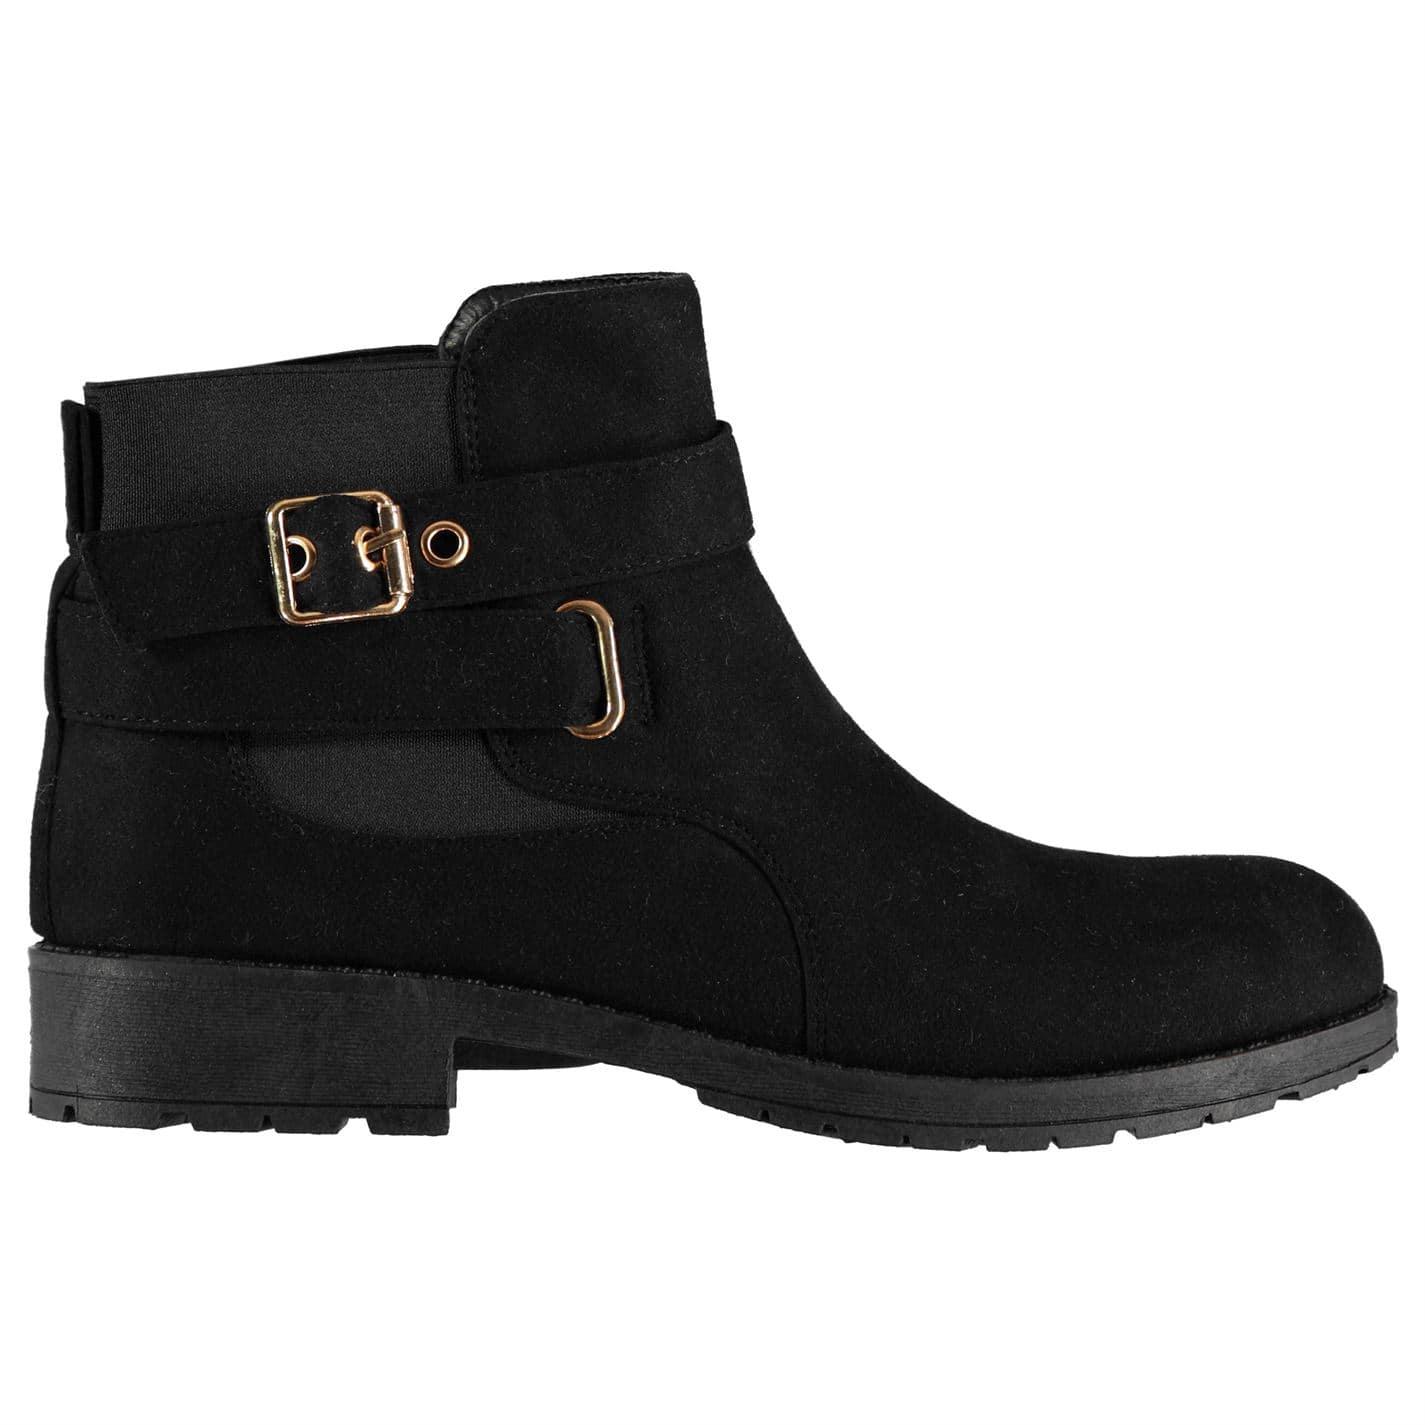 Miso Becca Junior Girls Boots